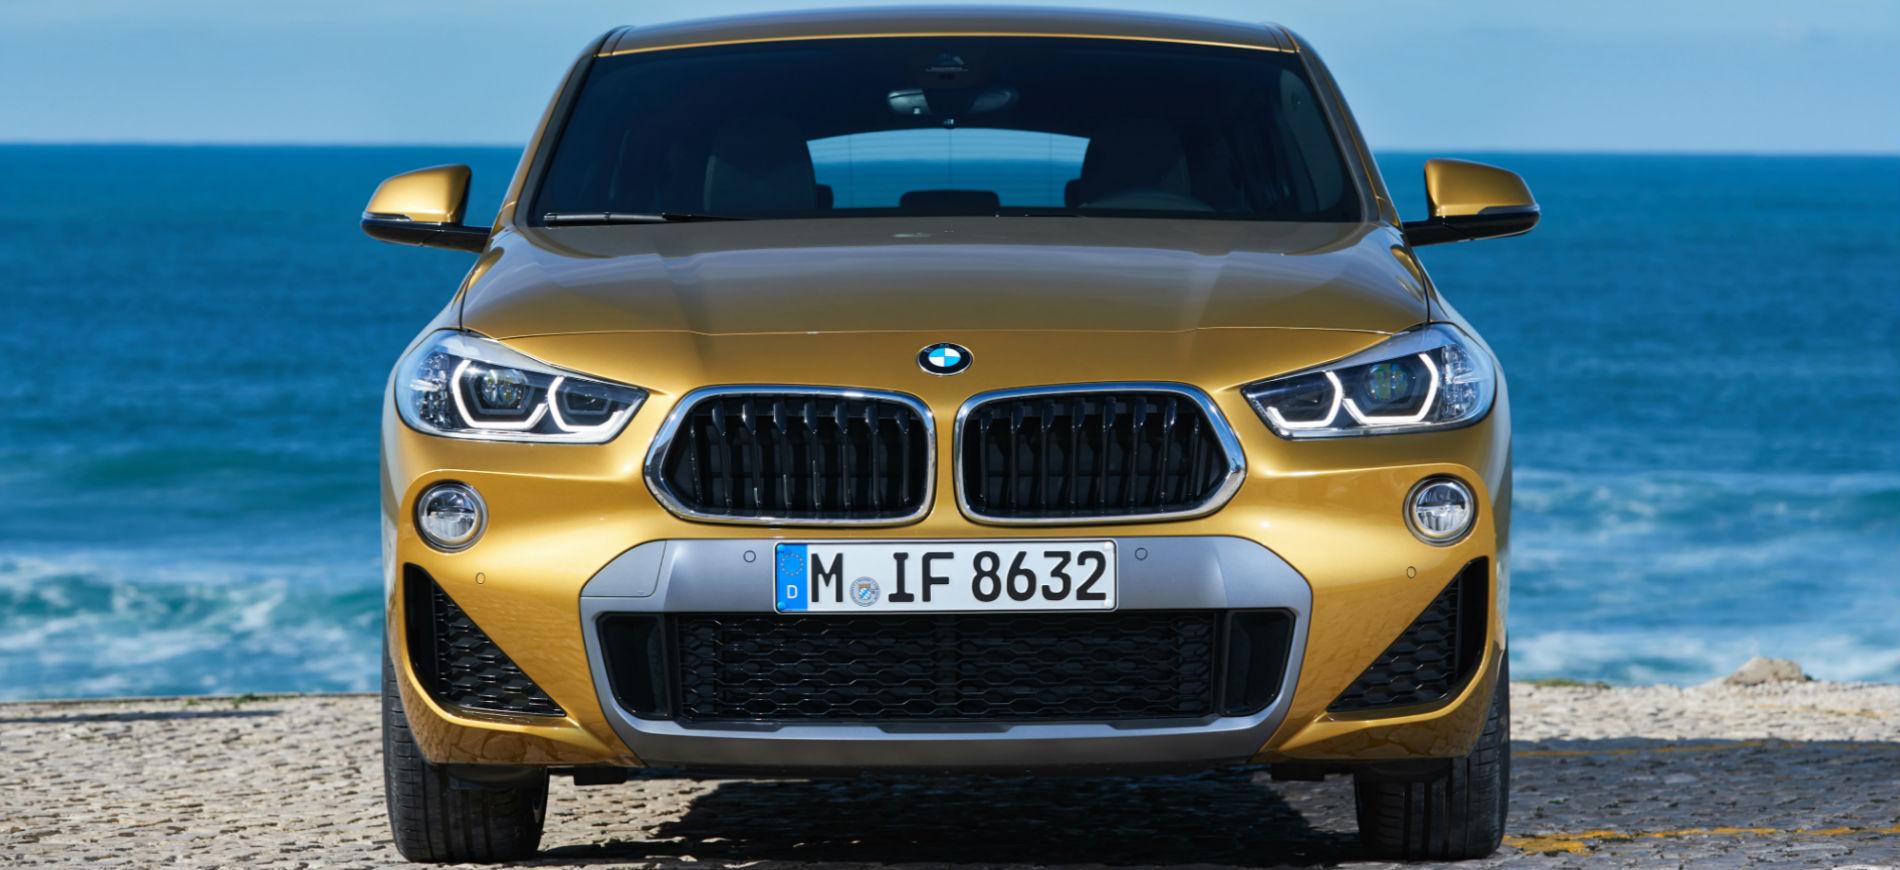 BMW X2: immagine frontale, in spiaggia